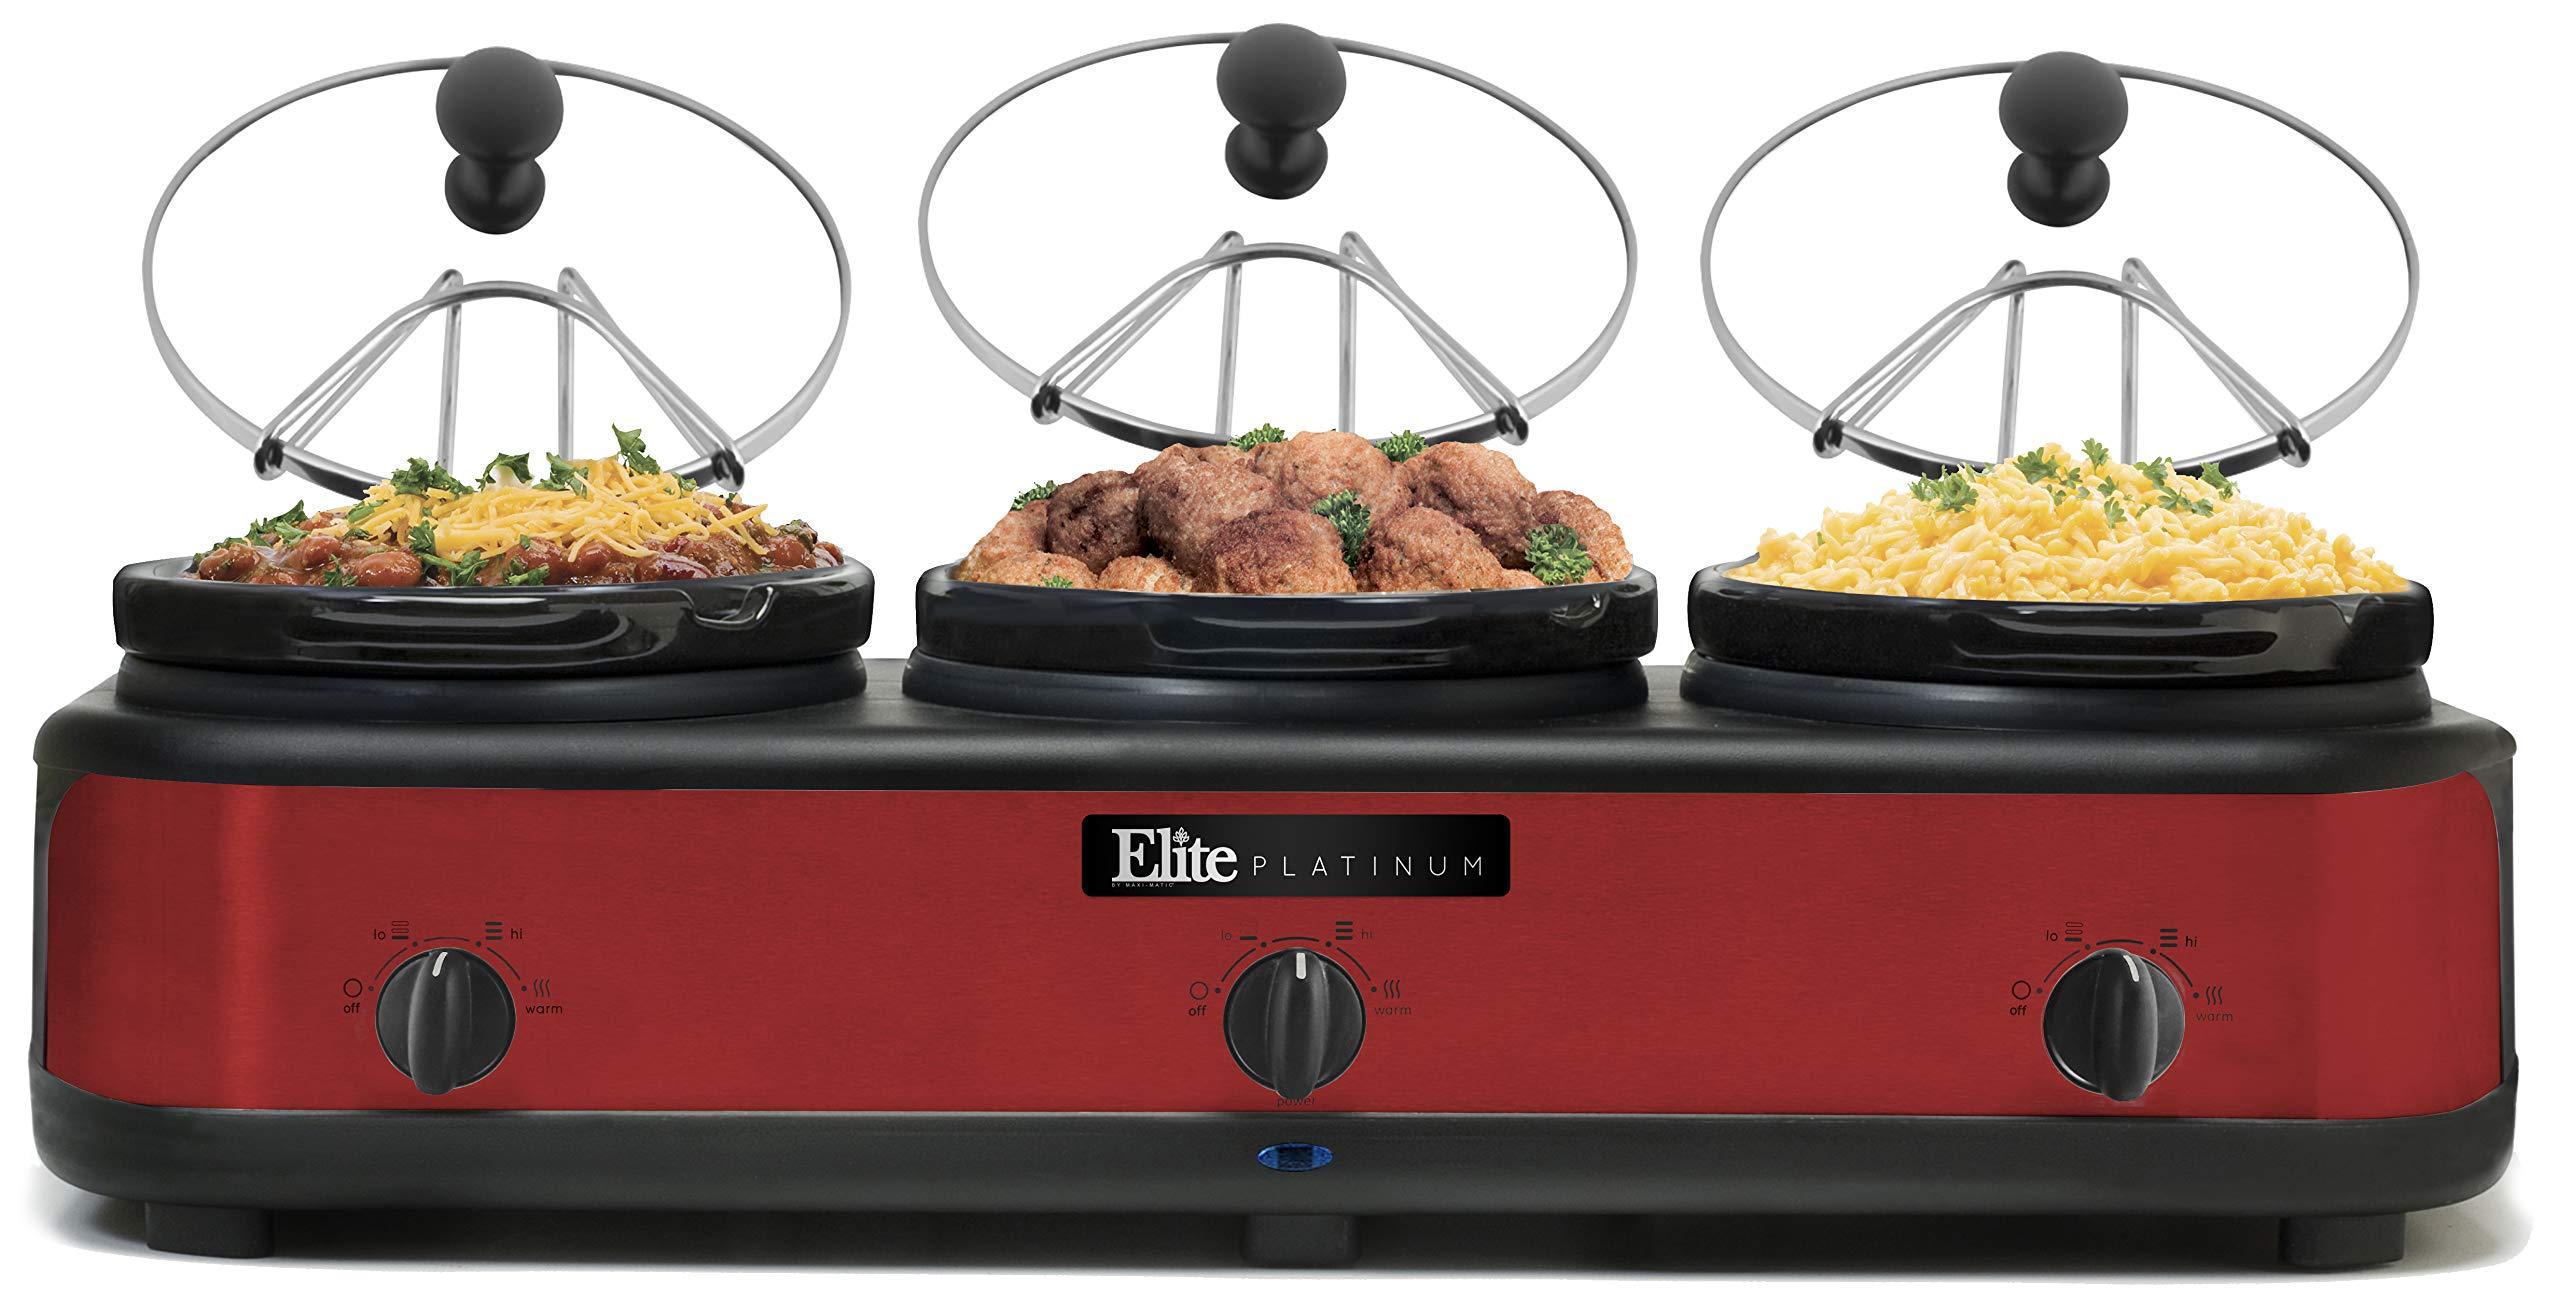 Elite Platinum EWMST-325R Triple Slow Cooker Buffet Server, Warmer, Adjustable Temp Dishwasher-Safe Oval Ceramic Pots, Lid Rests, 3 x 2.5Qt Capacity, Red by Maxi-Matic